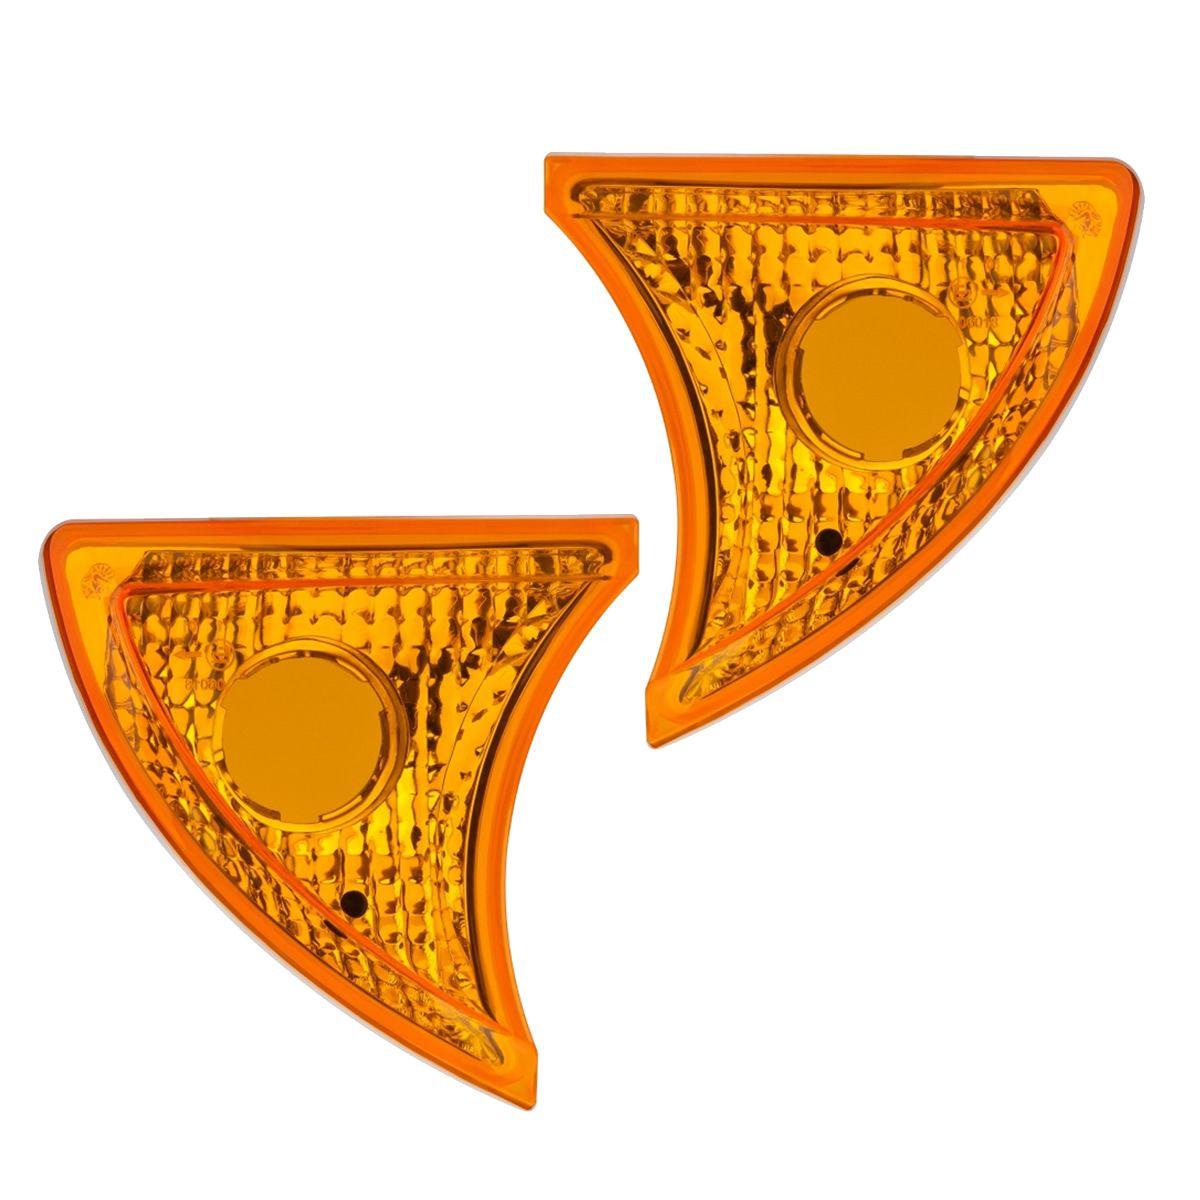 Par Lanterna Seta Pisca Iveco Stralis Tector Cursor Ap 2006 Amarela